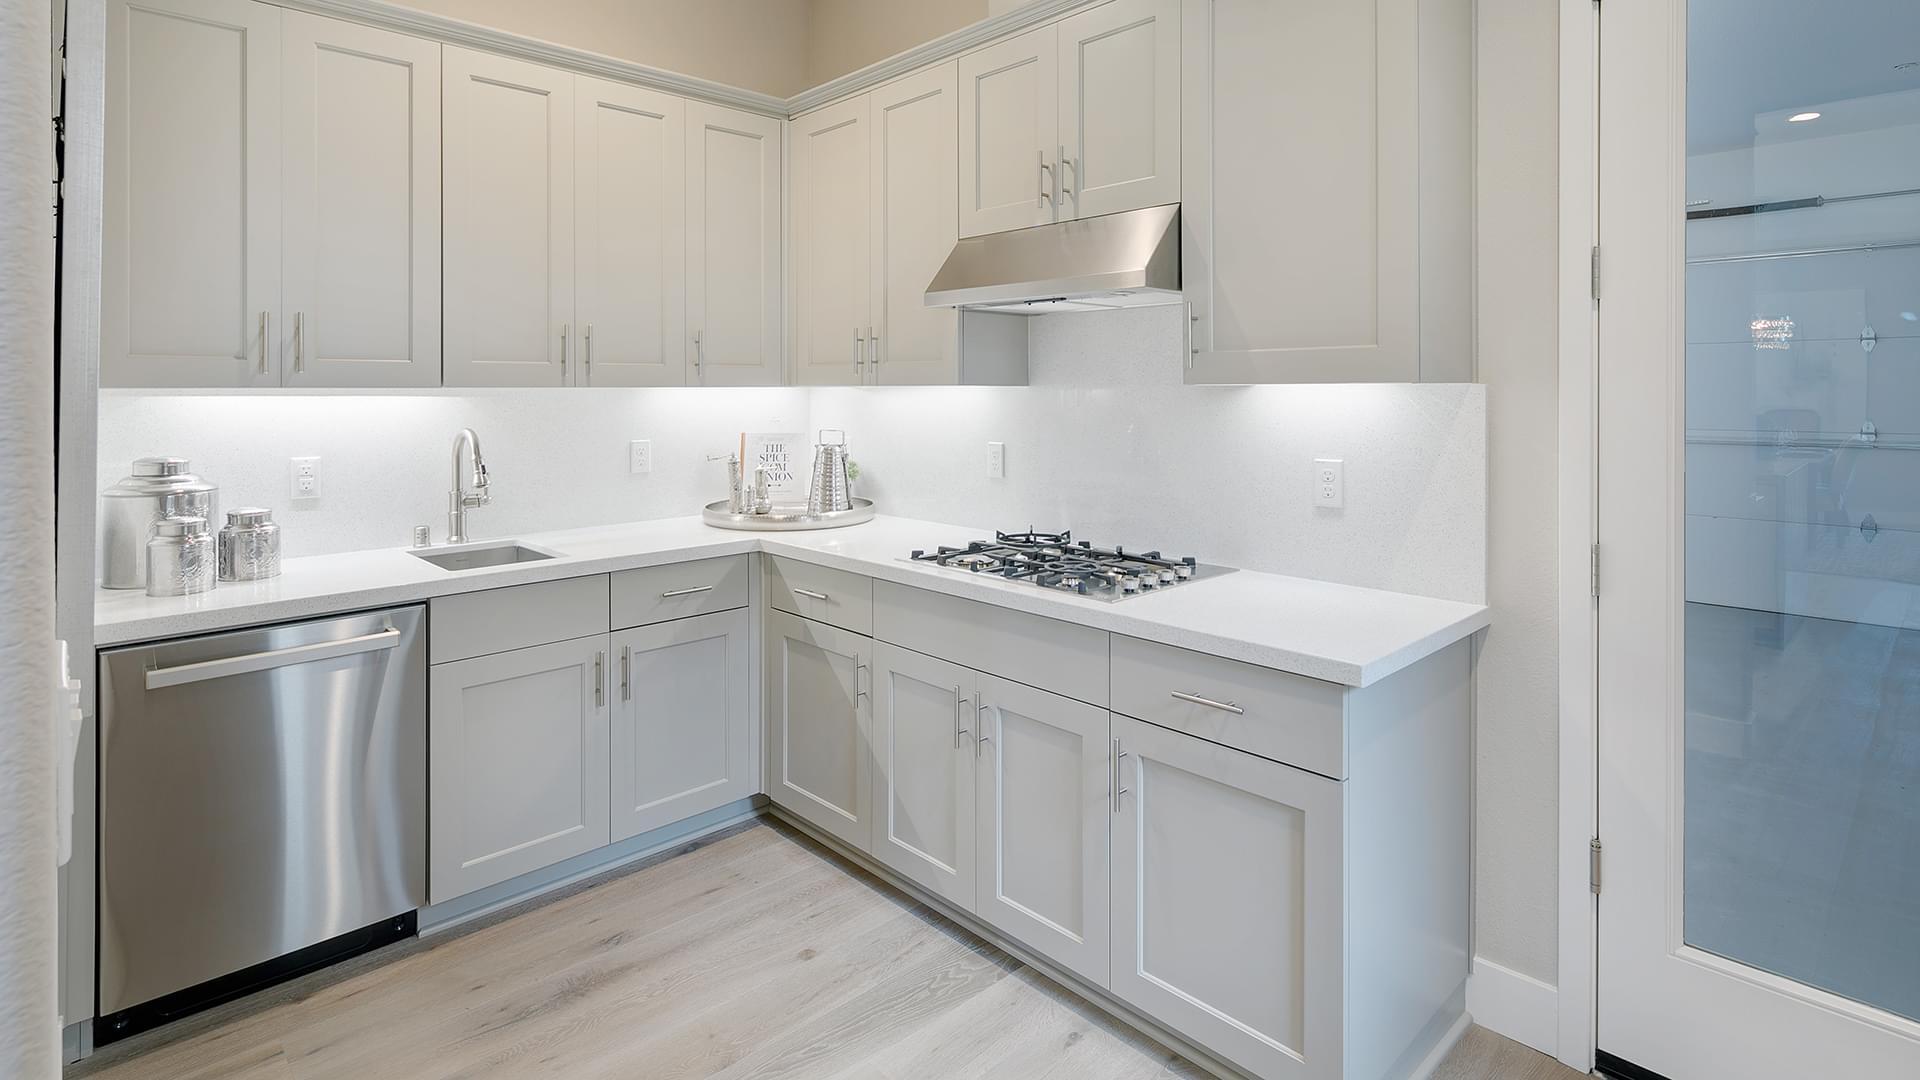 Residence 5B Prep Kitchen